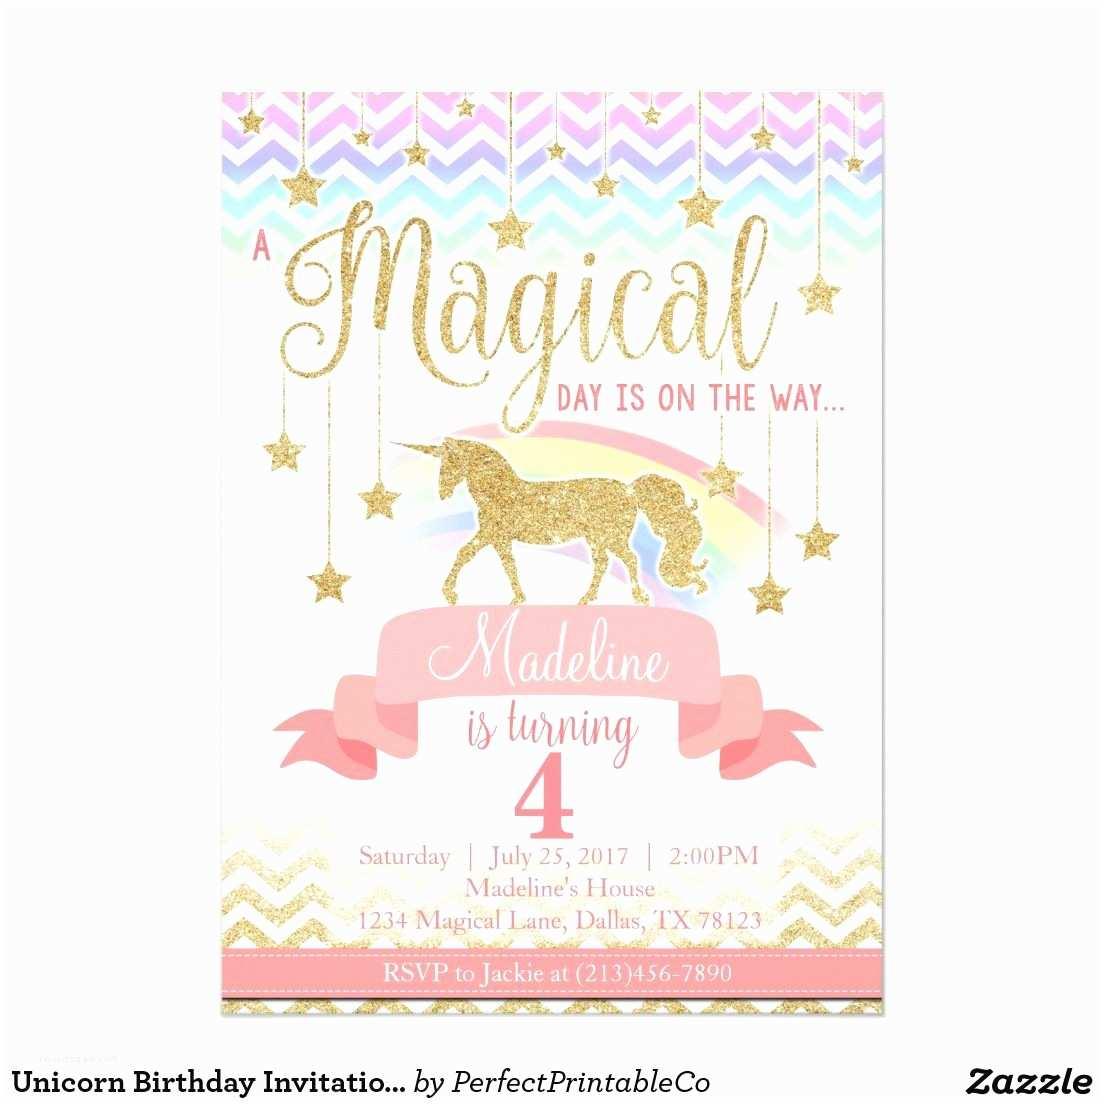 Unicorn Birthday Party Invitations Magical Rainbow Unicorn Birthday Party Invitation